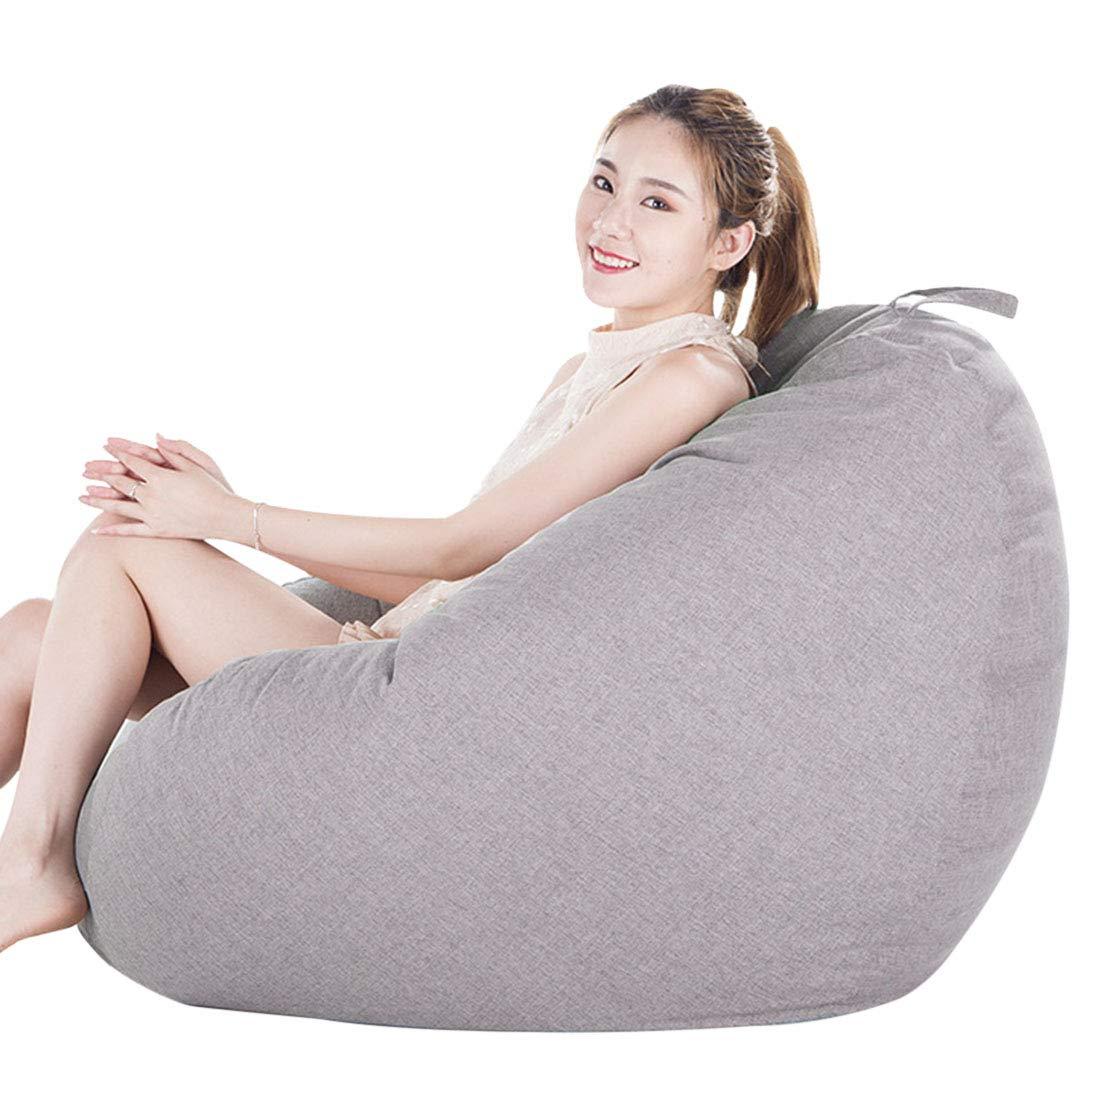 Xianheng Adult Bean Bag Memory Foam Beanbag Removable Cover Relaxing Sofa